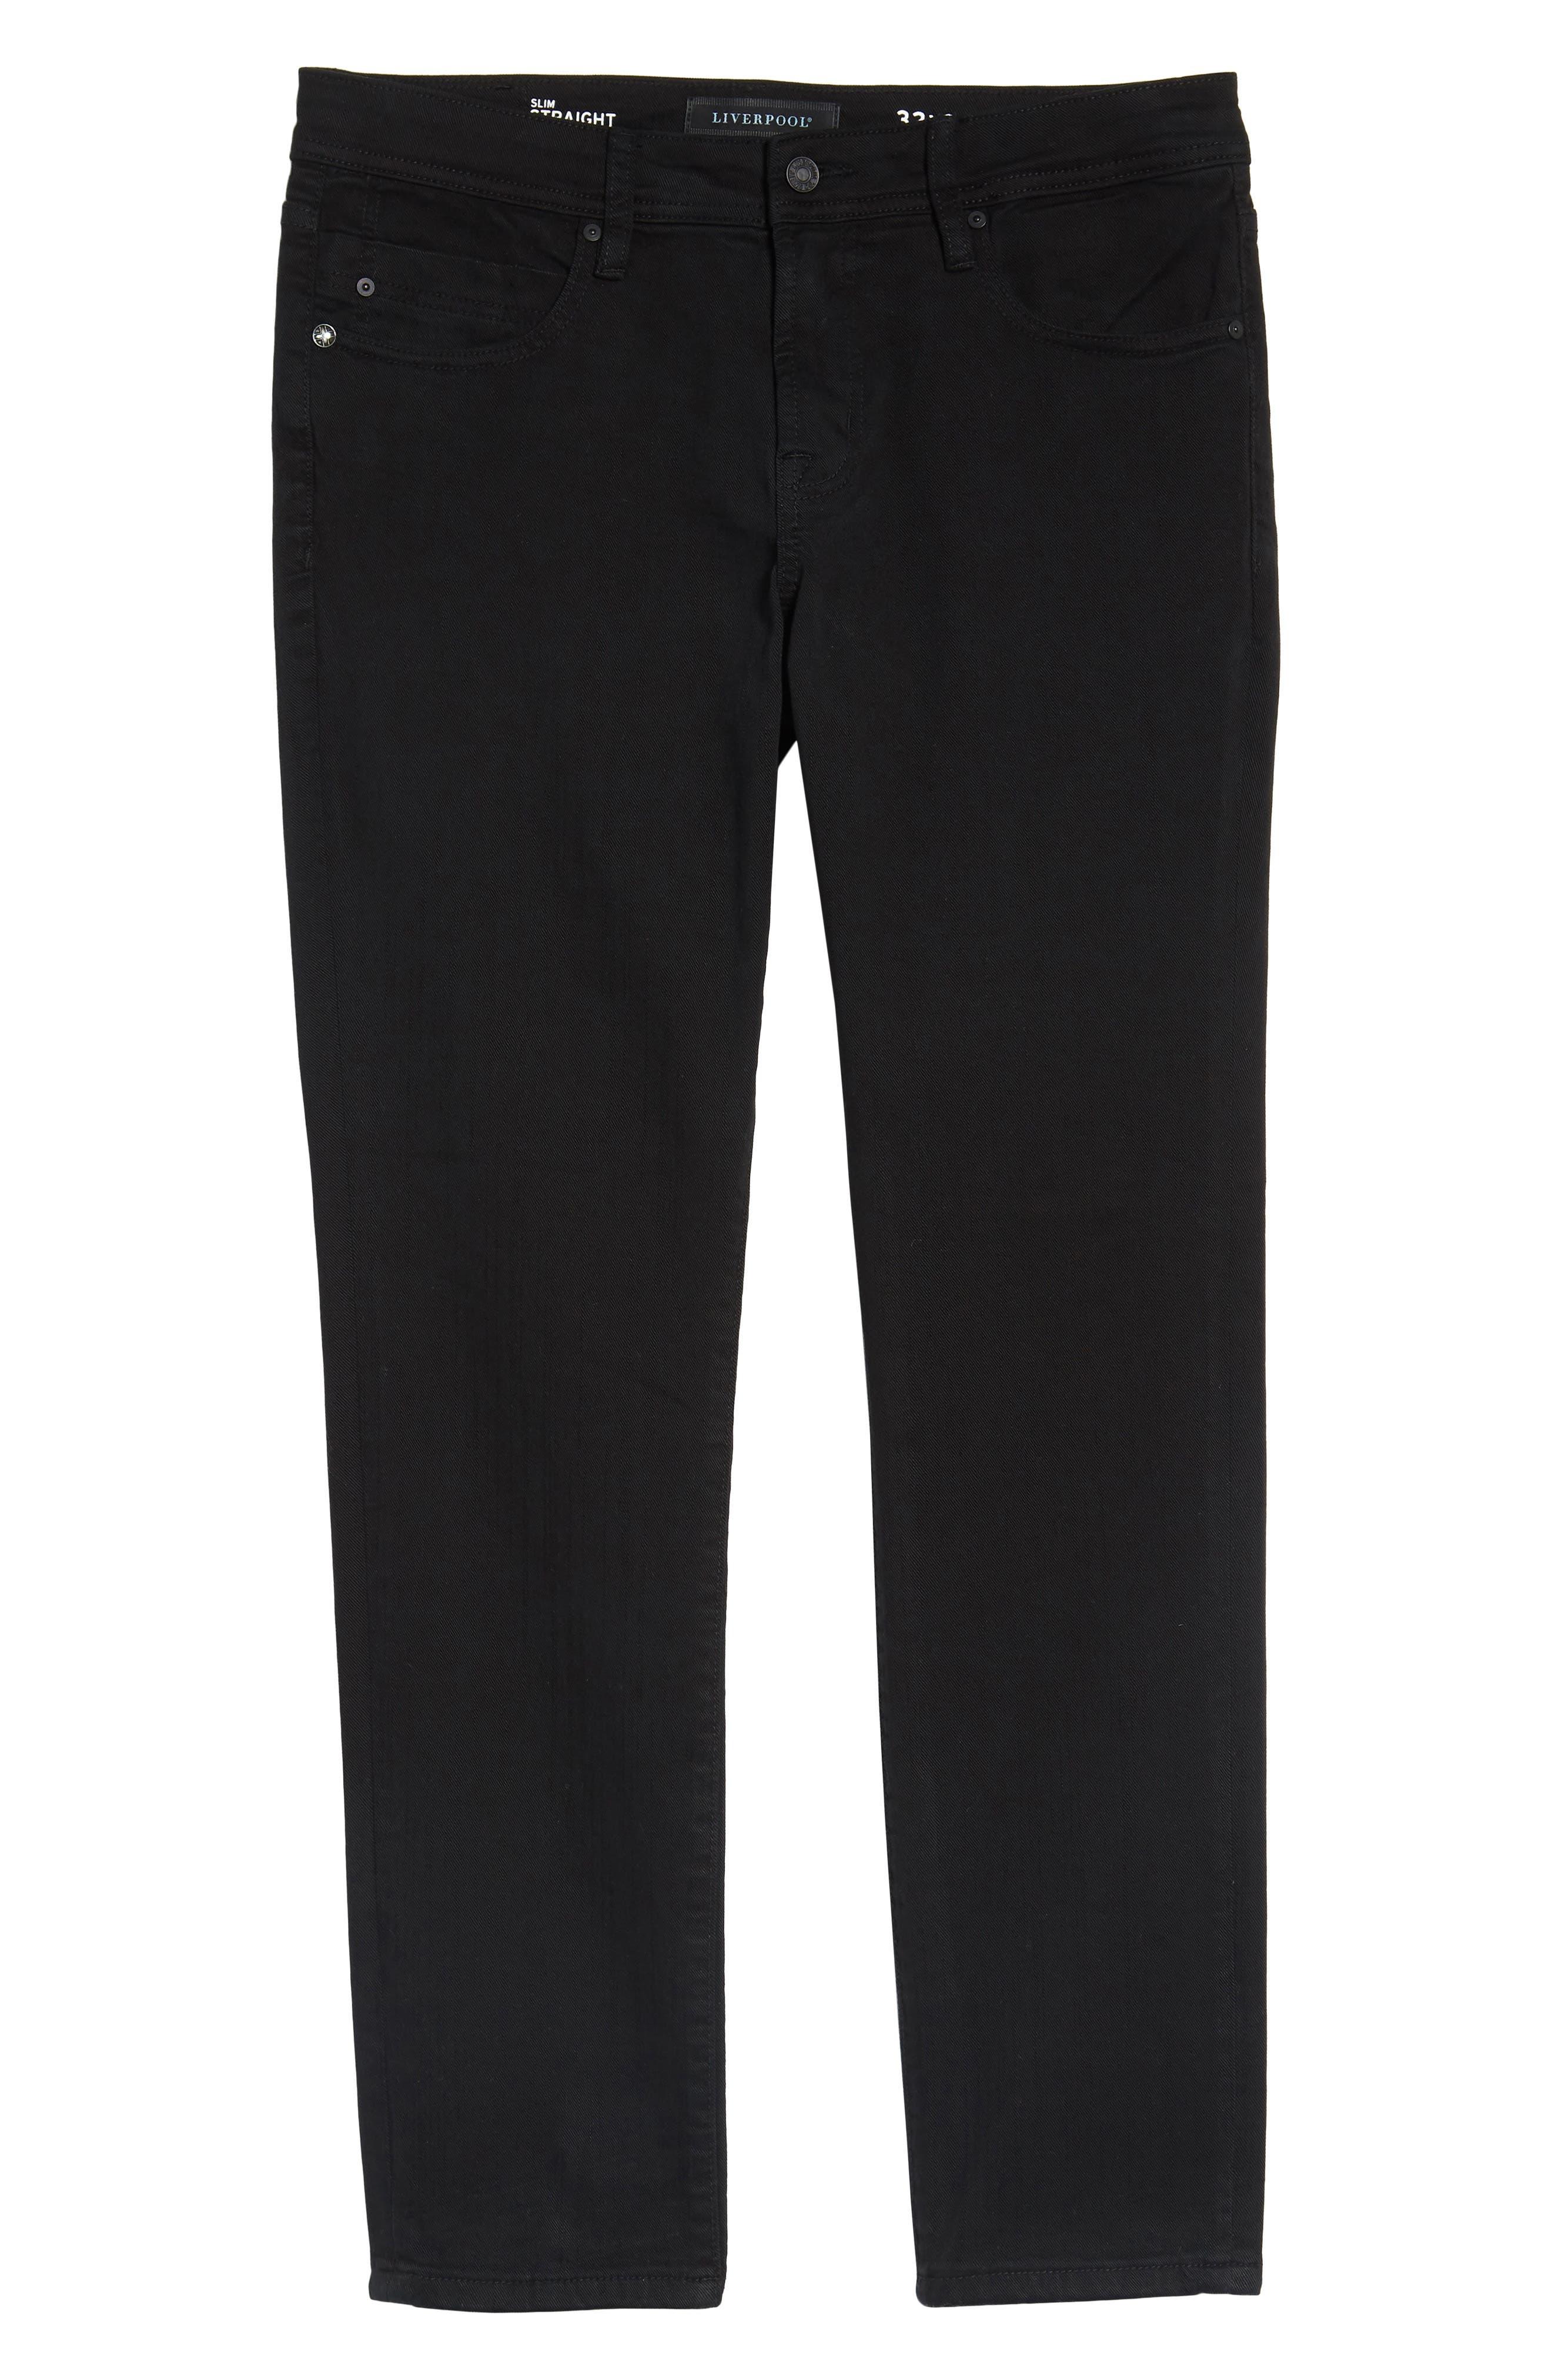 Jeans Co. Kingston Slim Straight Leg Jeans,                             Alternate thumbnail 6, color,                             Black Rinse